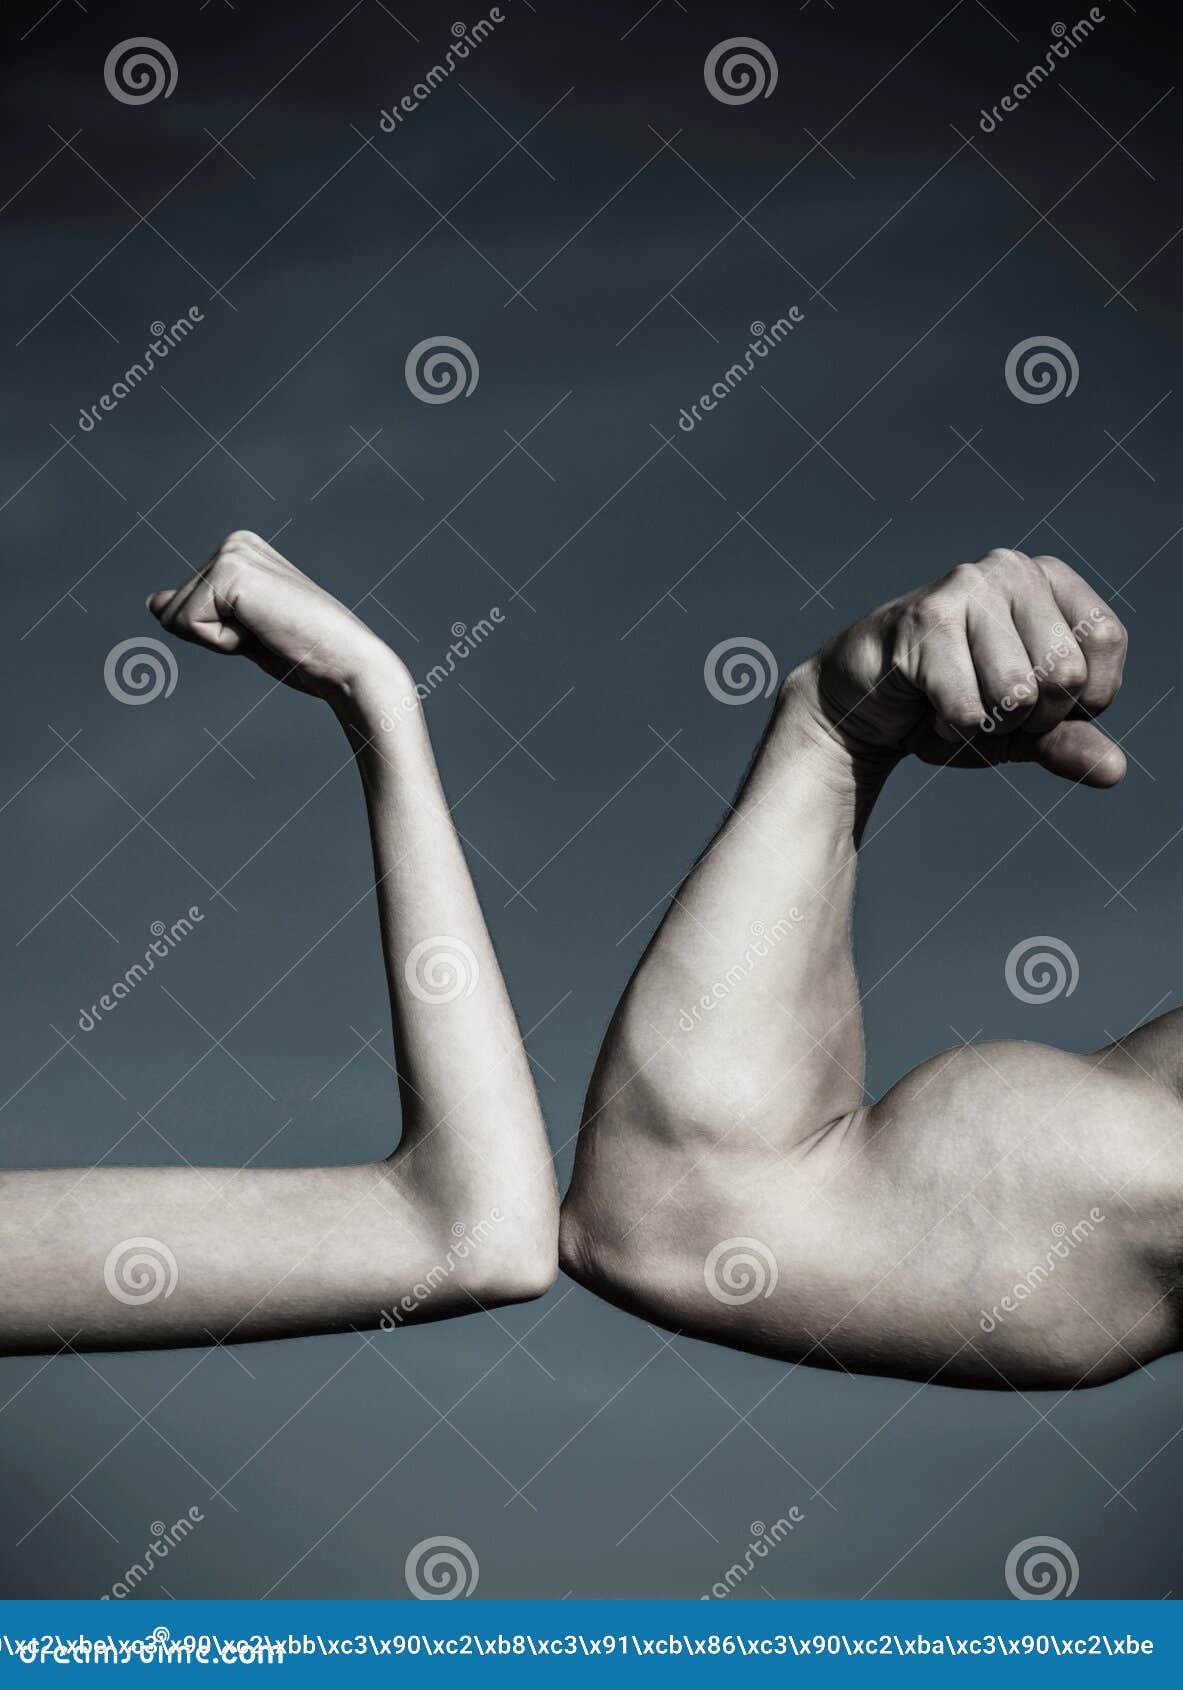 Rivalry, vs, challenge, strength comparison. Muscular arm vs weak hand. Vs, fight hard.Competition, strength comparison